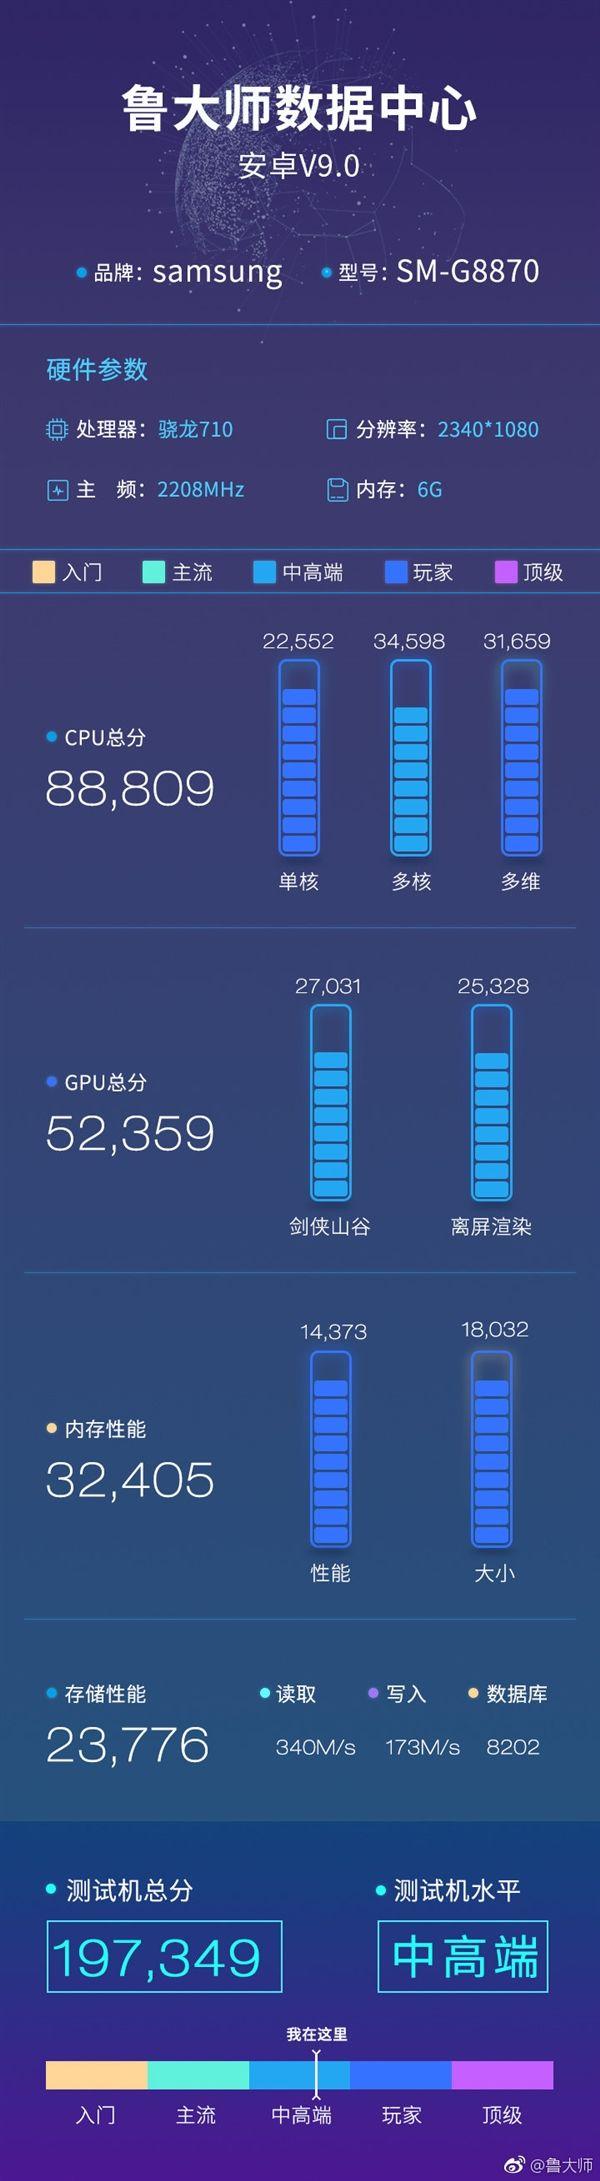 Опубликованы характеристики Samsung Galaxy A8s – фото 2